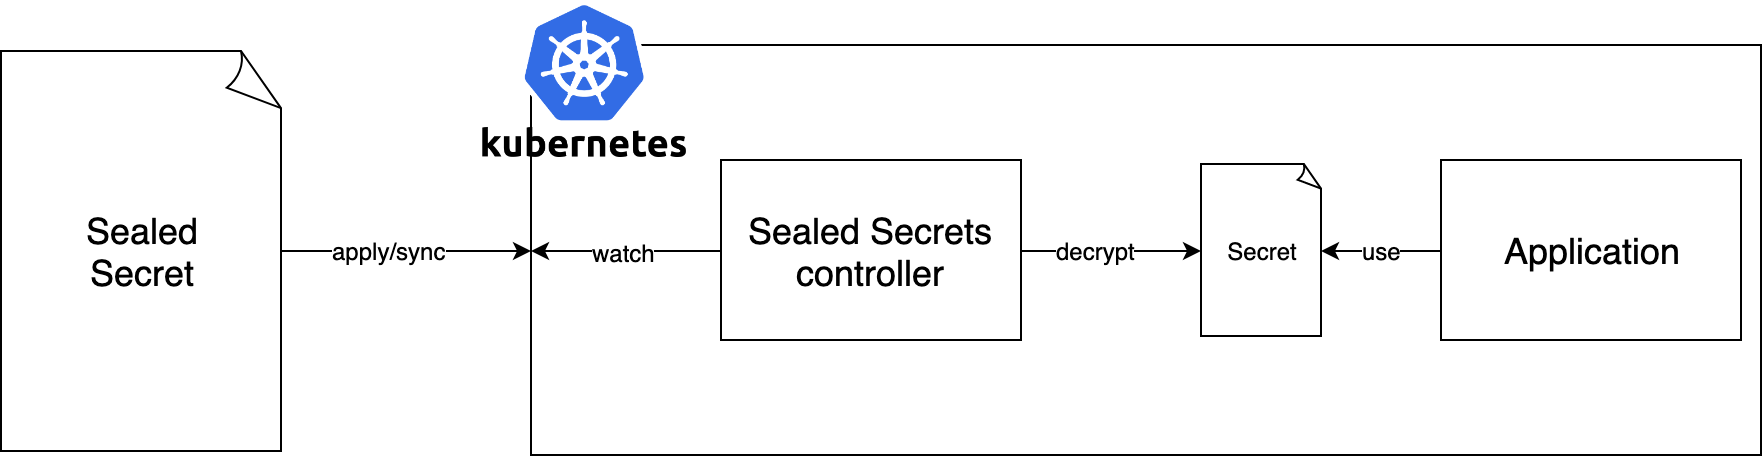 Managing secrets the GitOps way